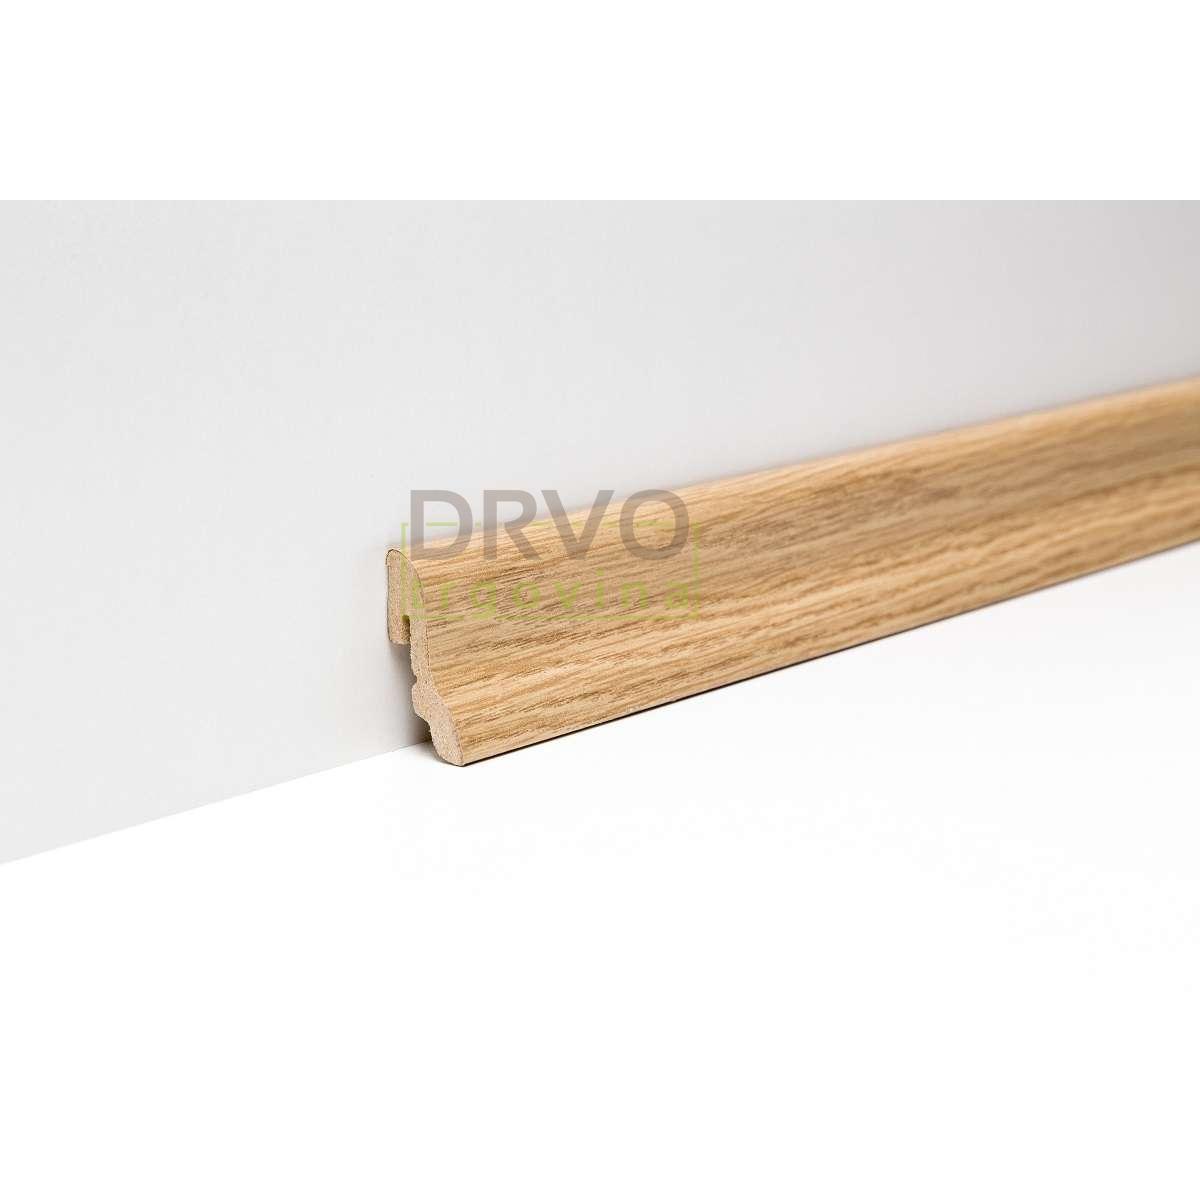 LETVICA ZA LAMINAT 38,5mm FOEI055 FU18L 1665/5338/958/5985 2,4m